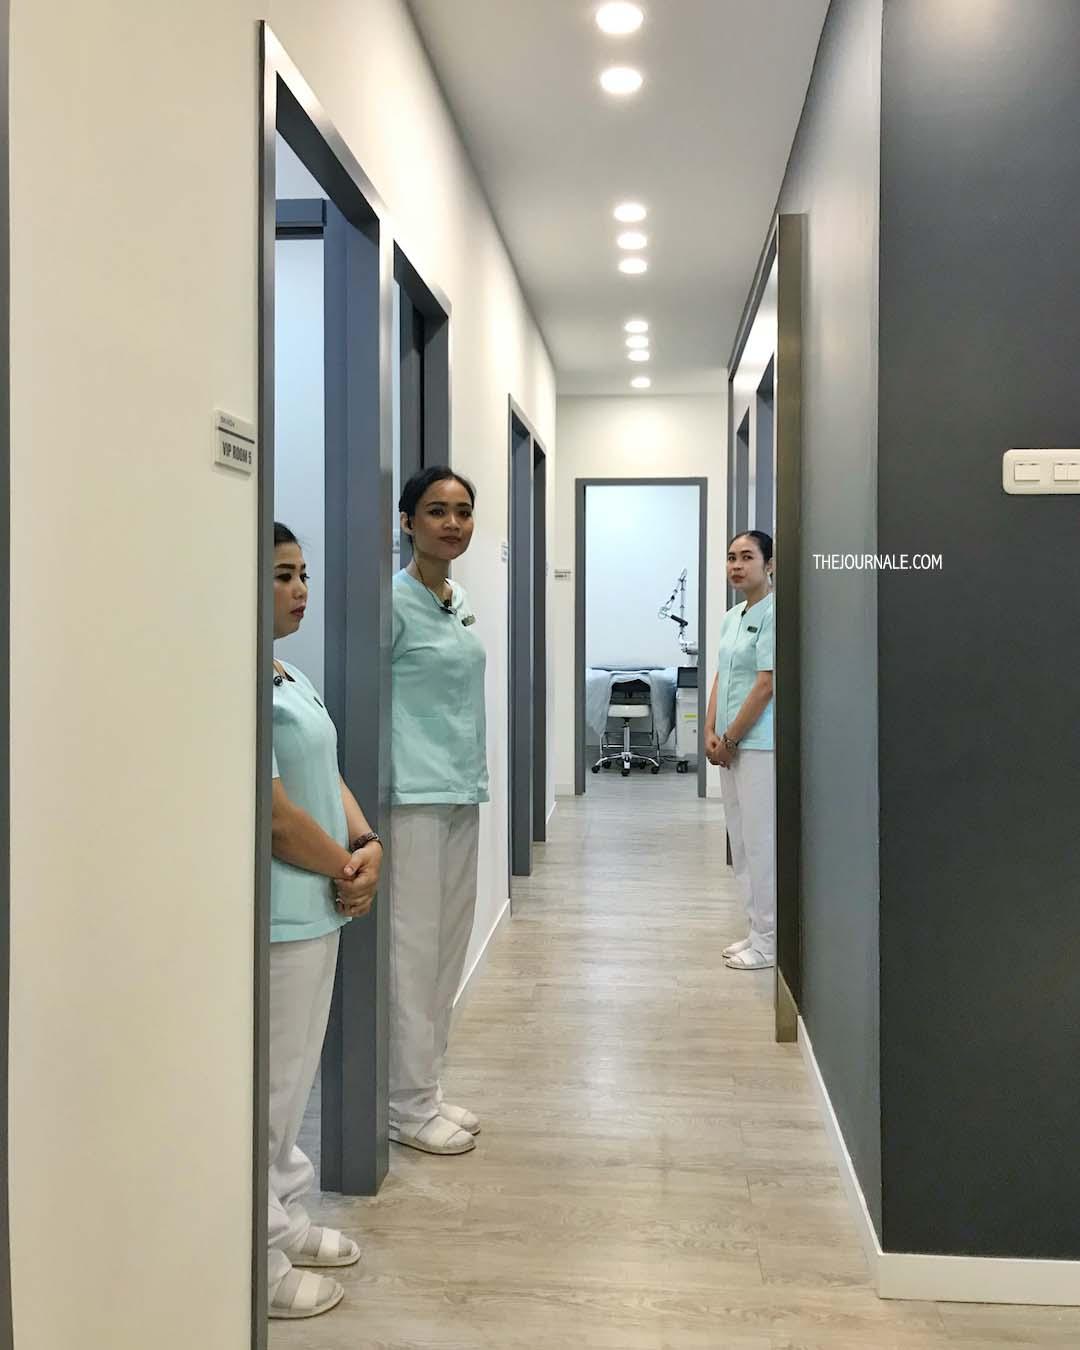 Kenalan sama SKINDA Dermatology: Klinik dari Korea